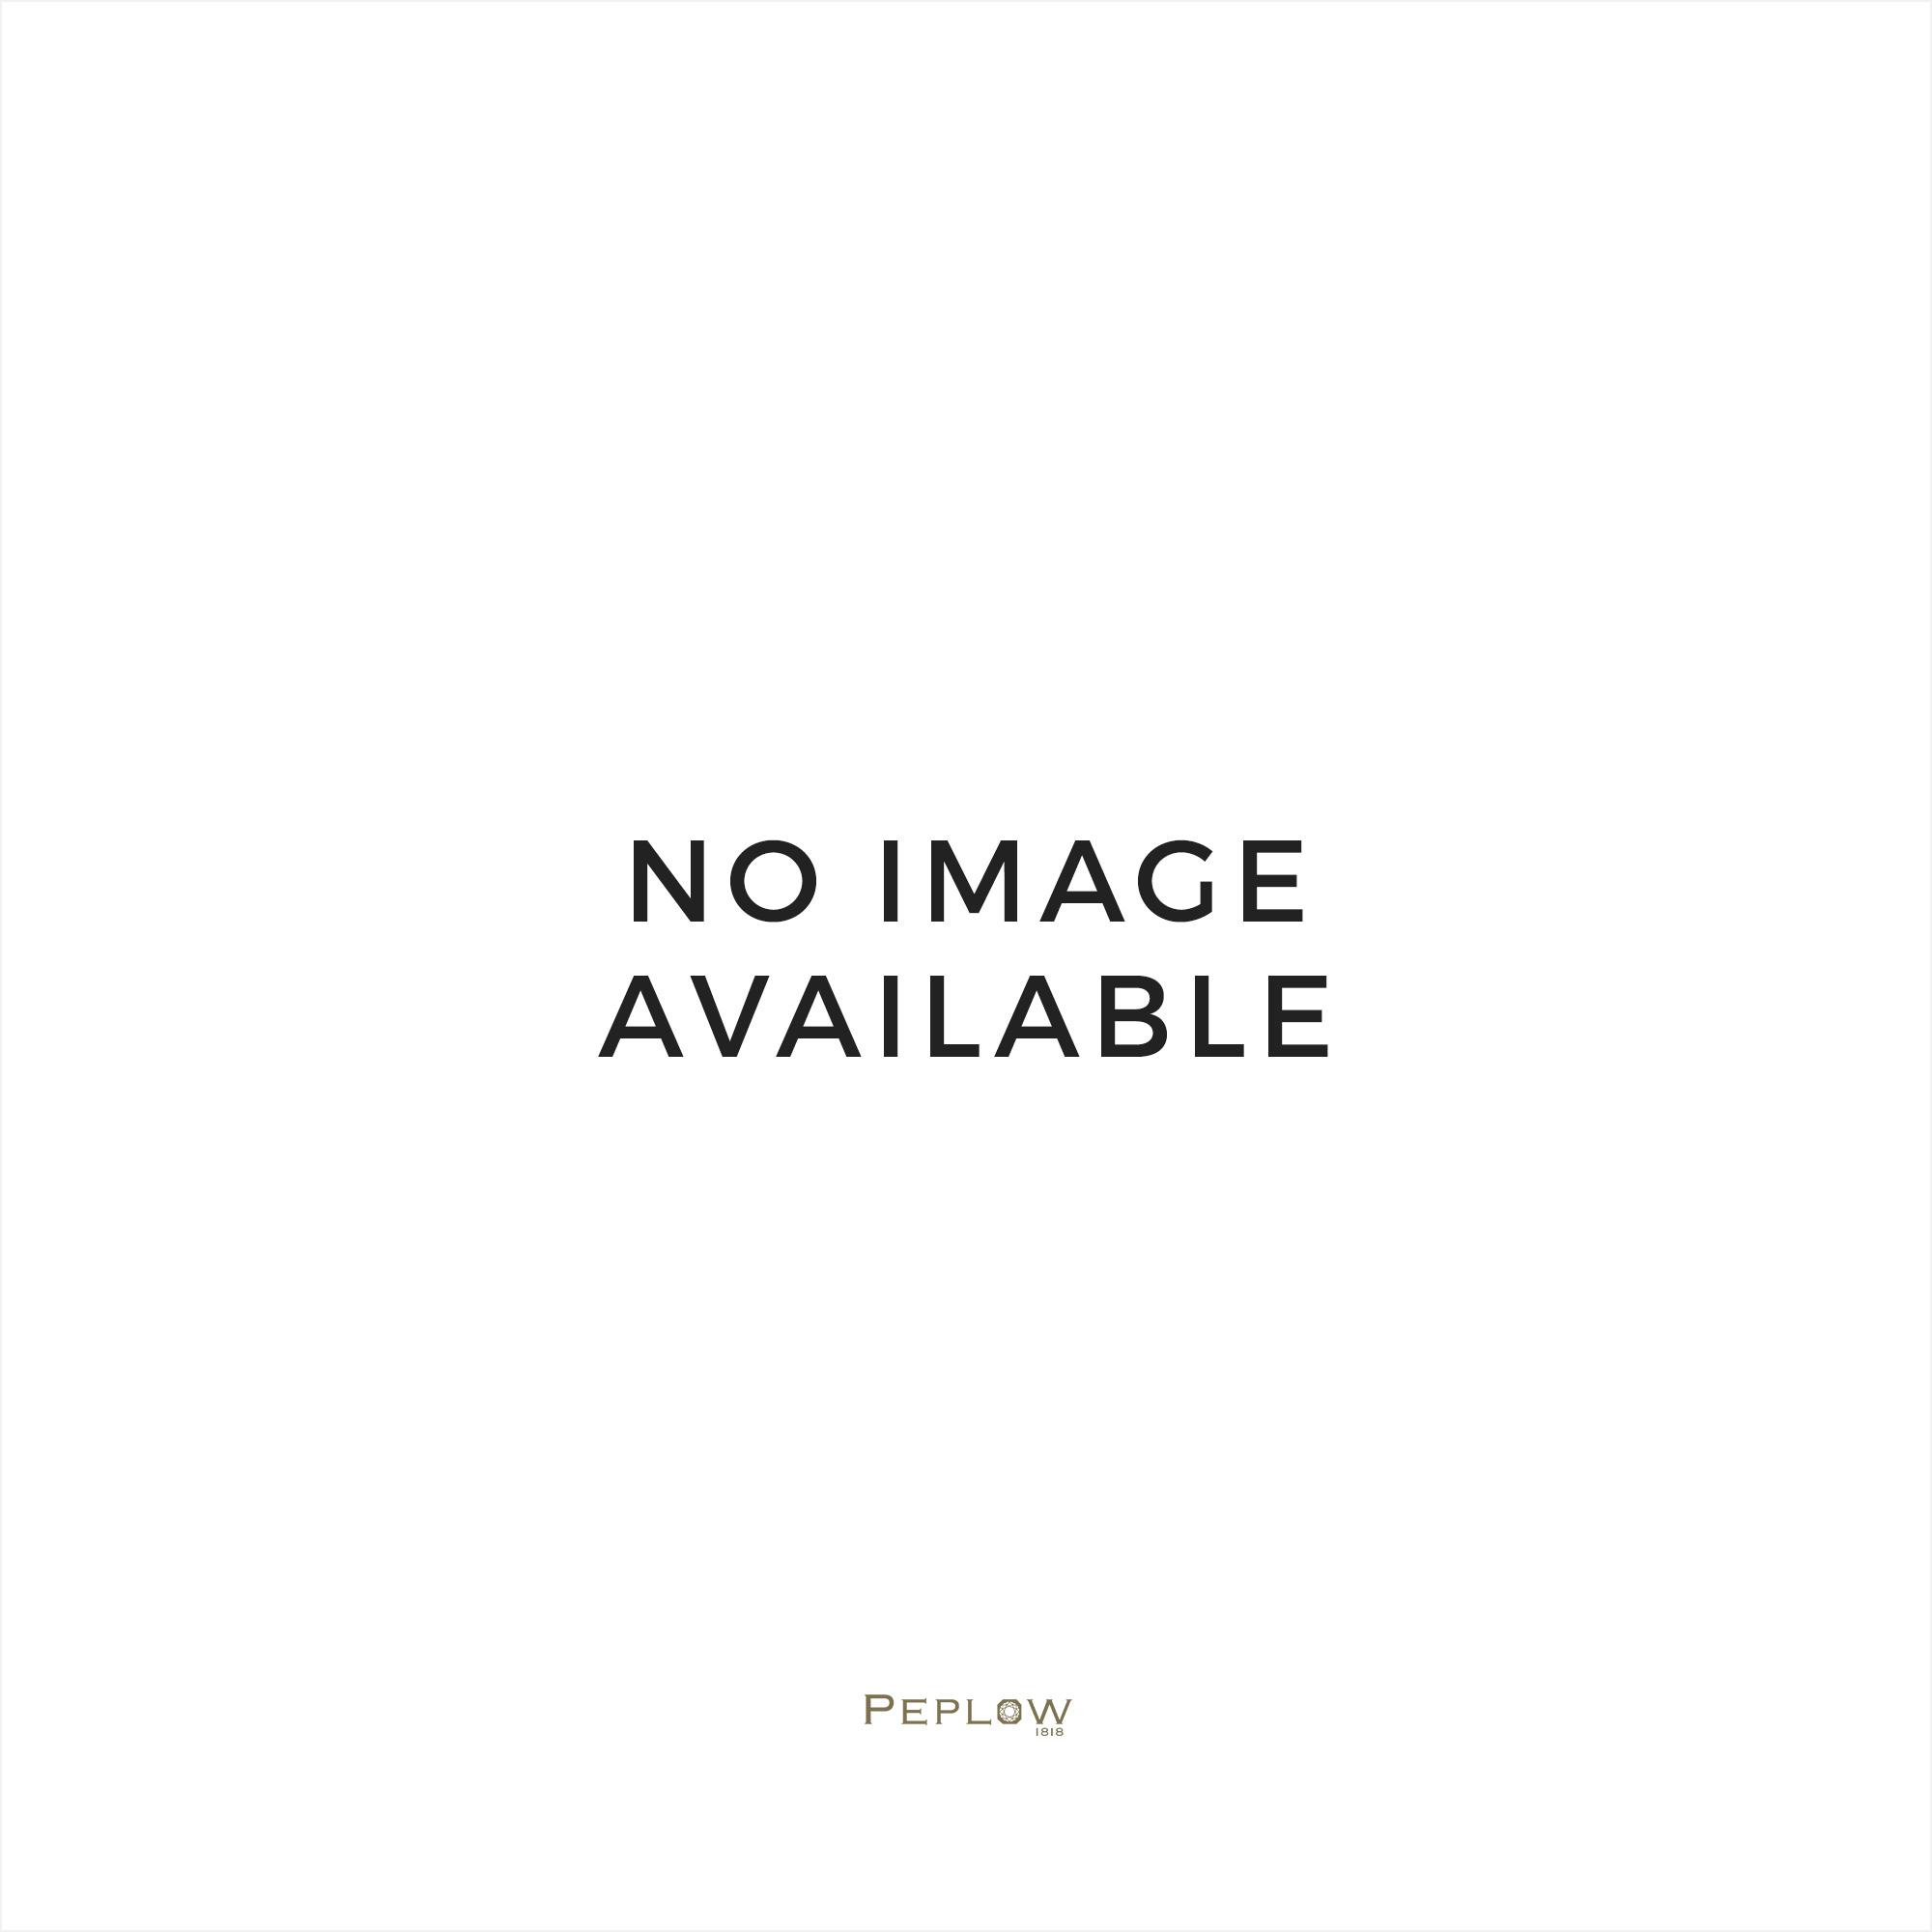 Festina Originals Tour Edition Chronograph watch with red strap